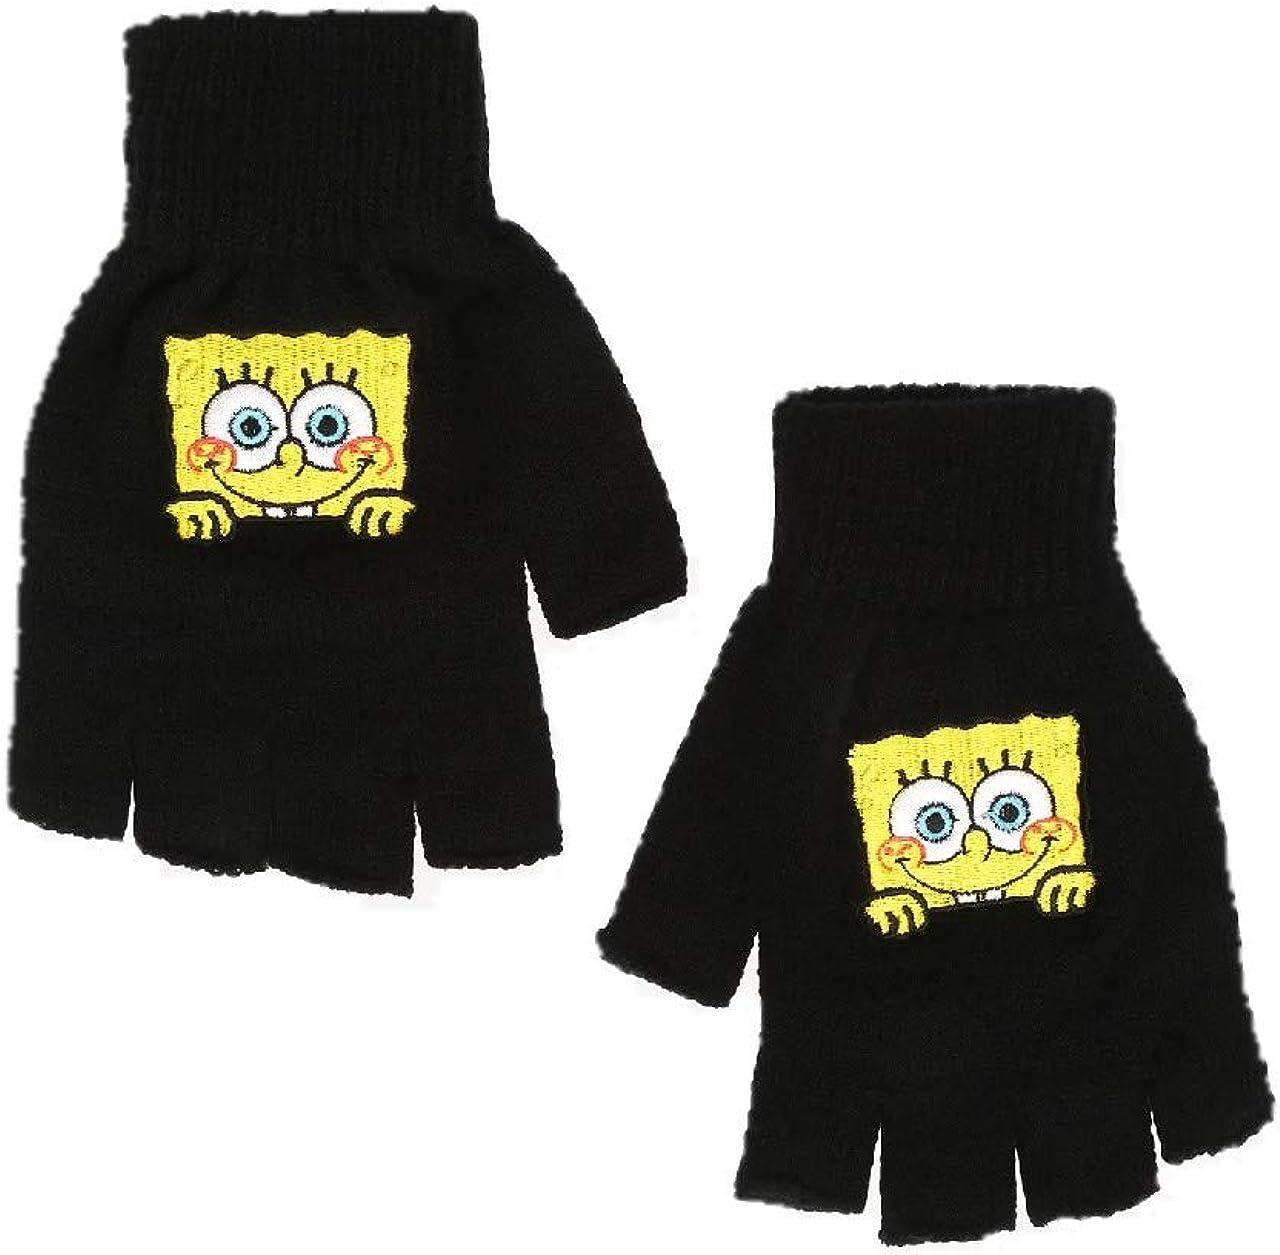 SpongeBob SquarePants Peekaboo Fingerless Gloves